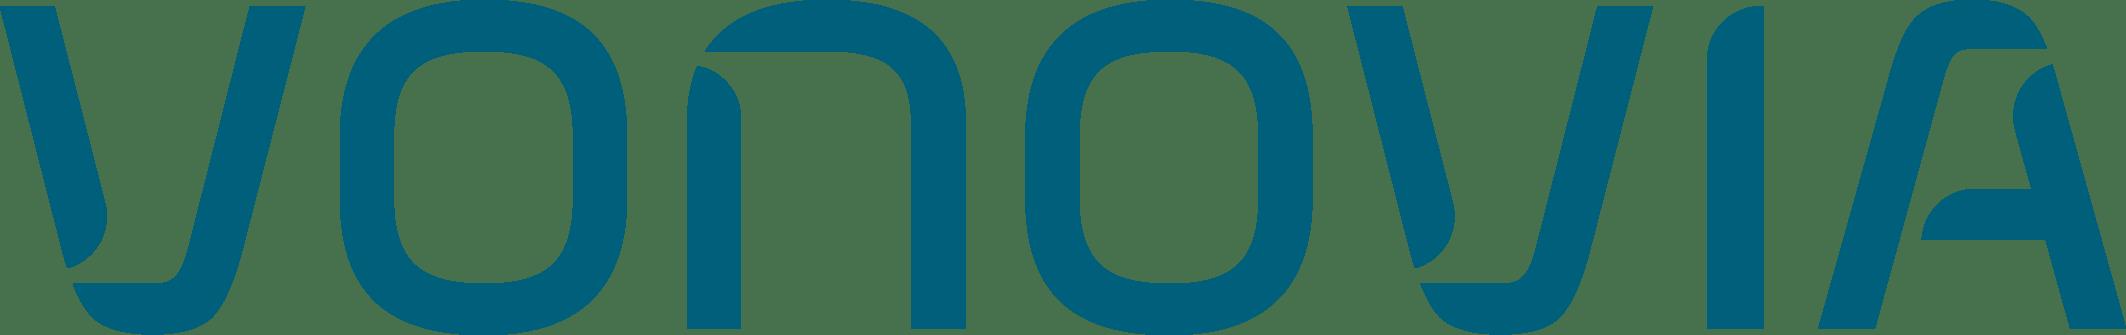 Digital / Online Marketing Manager (m/w)